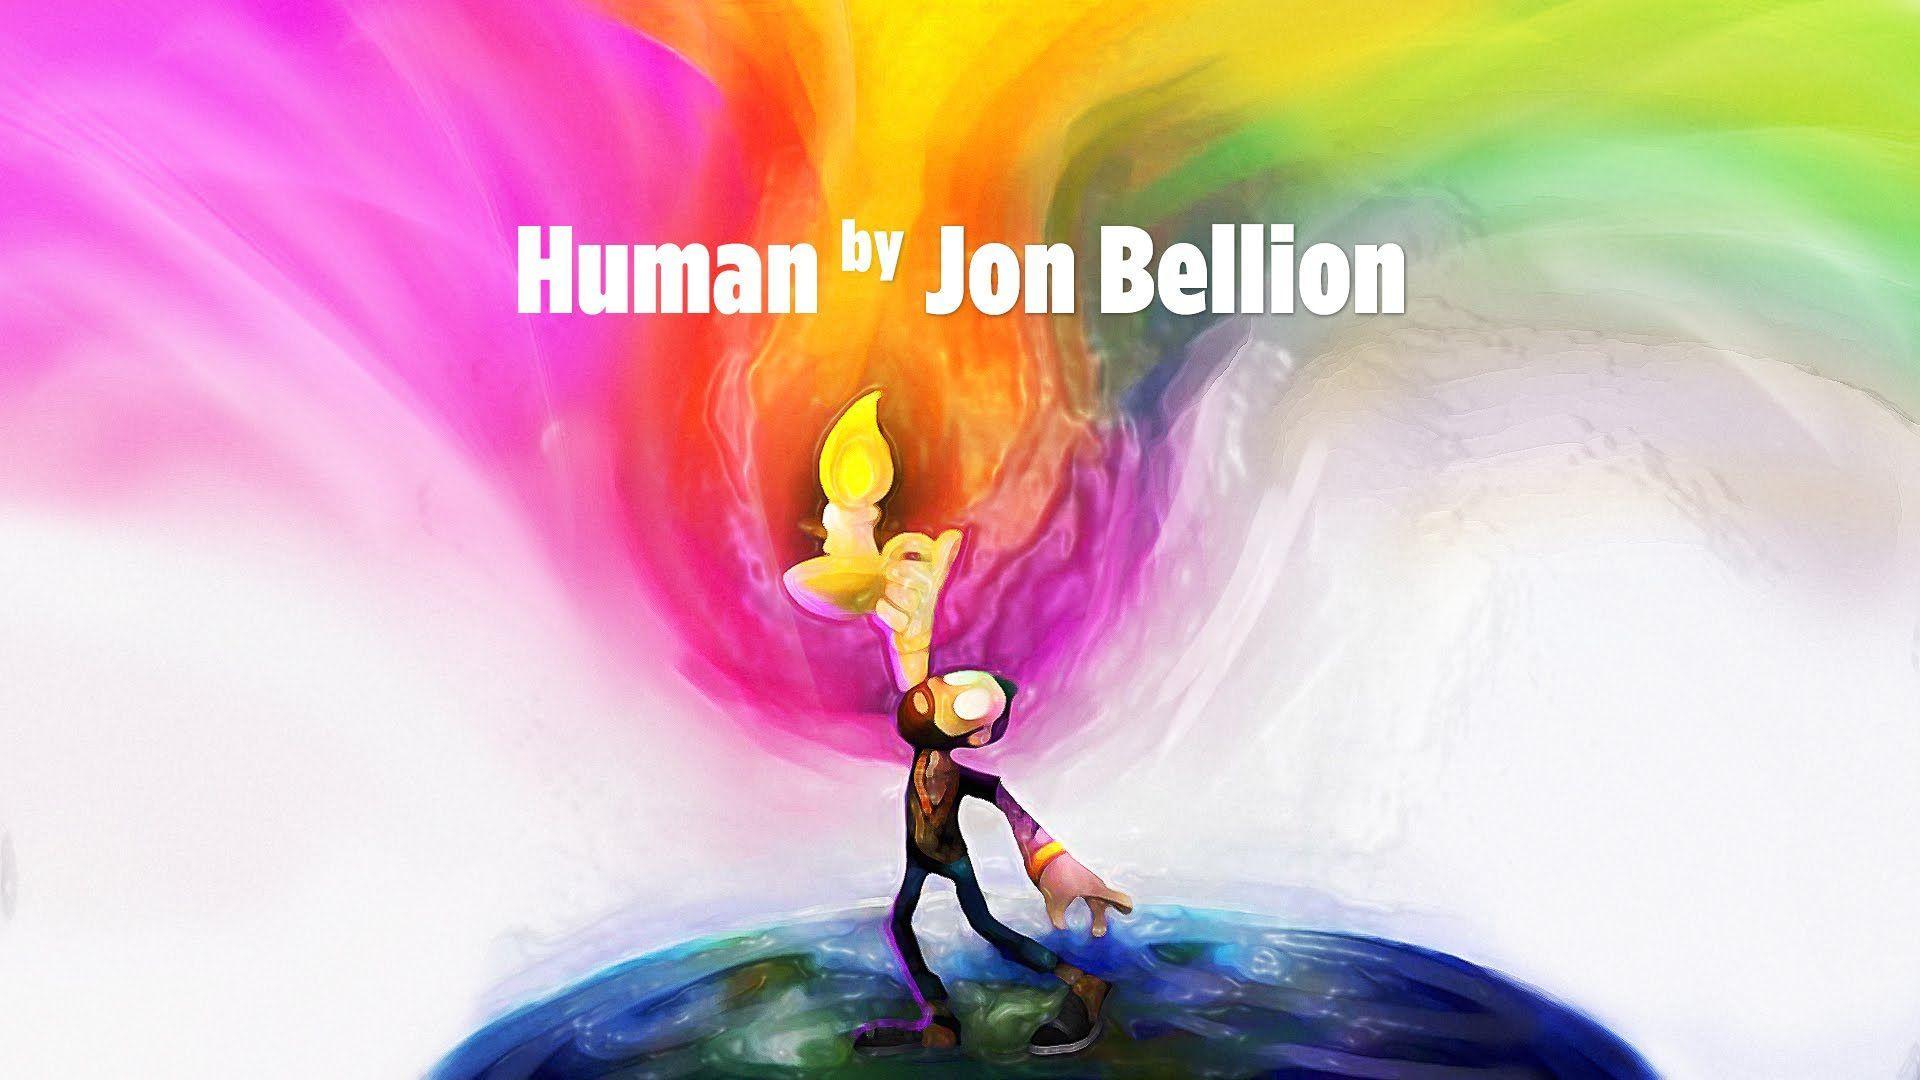 download jon bellion human